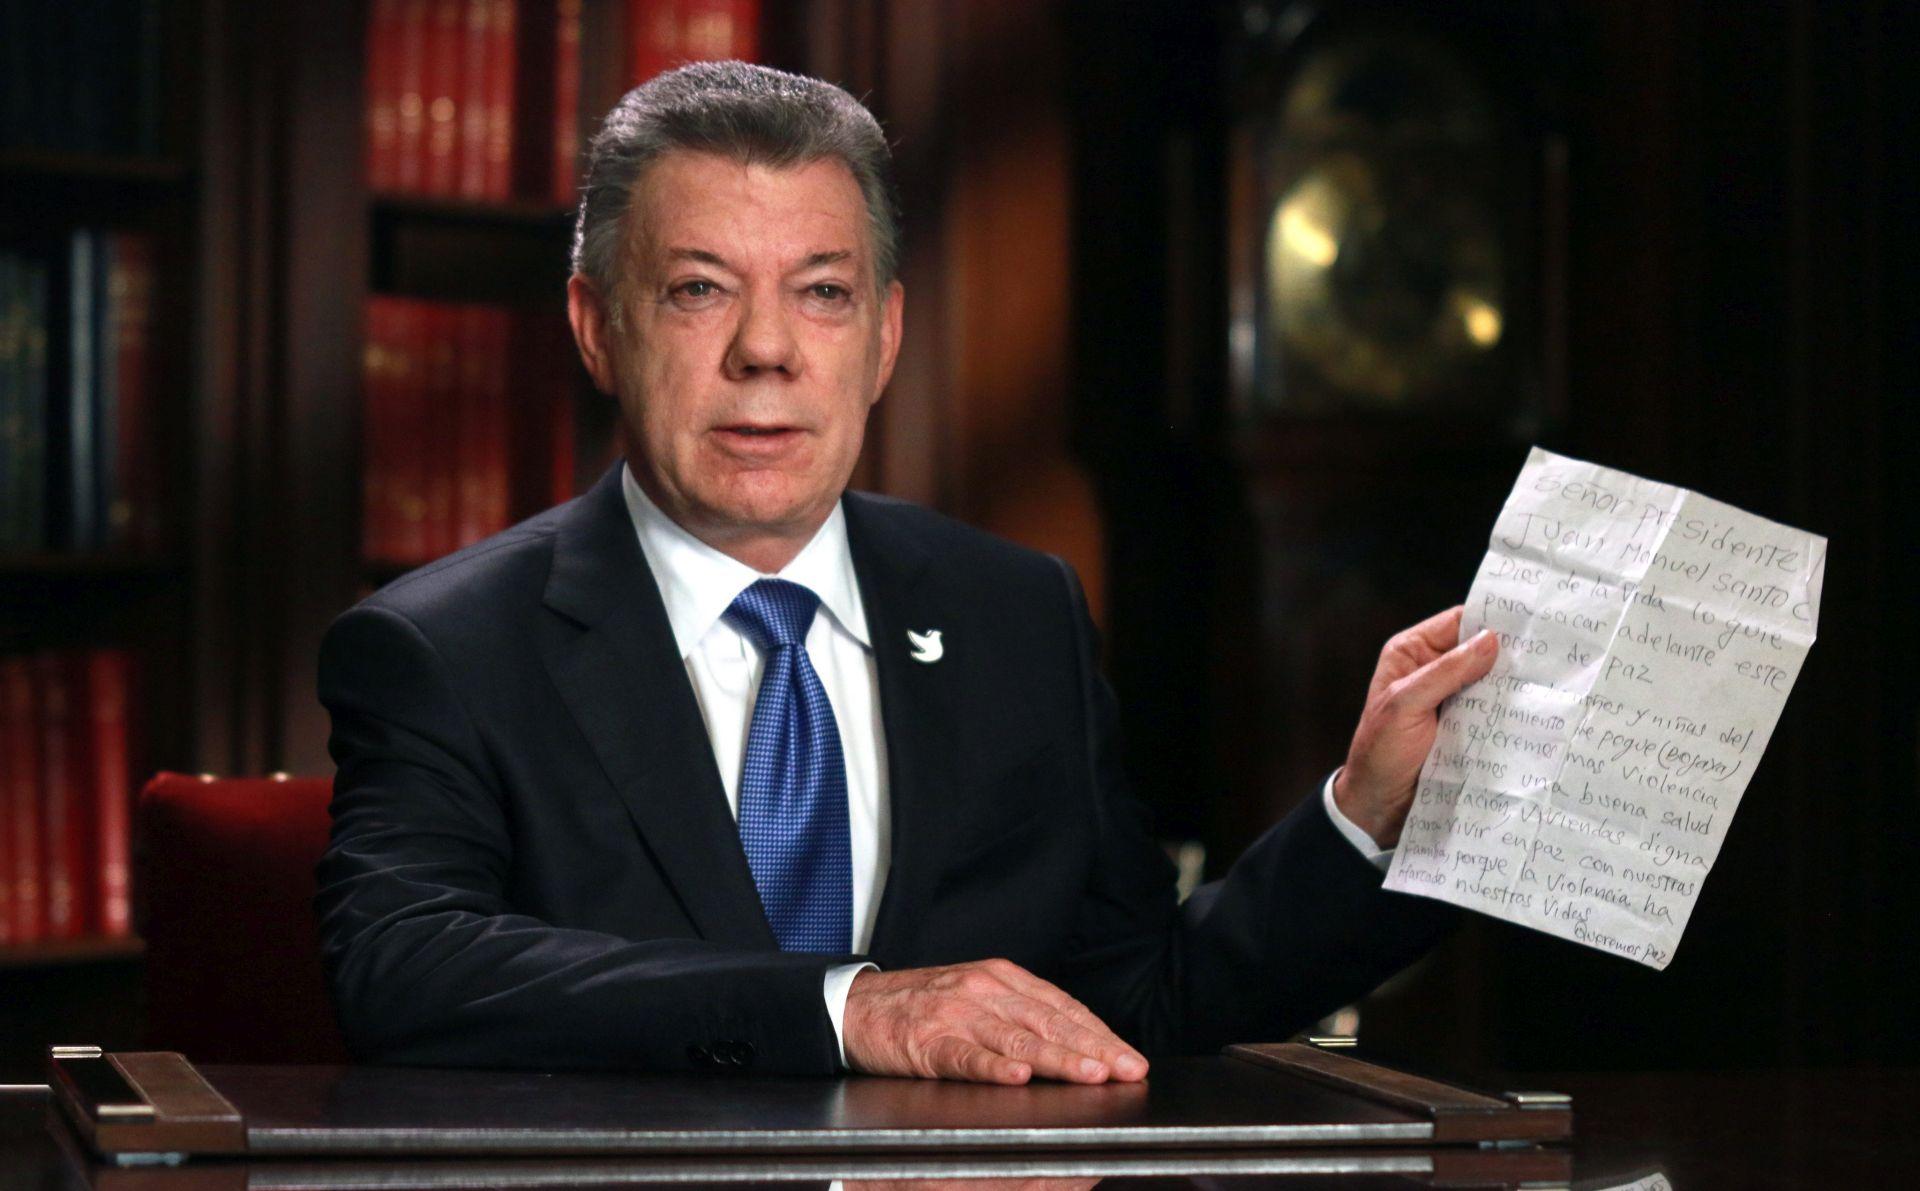 KOLUMBIJA Santos produljio primirje s FARC-om do kraja godine